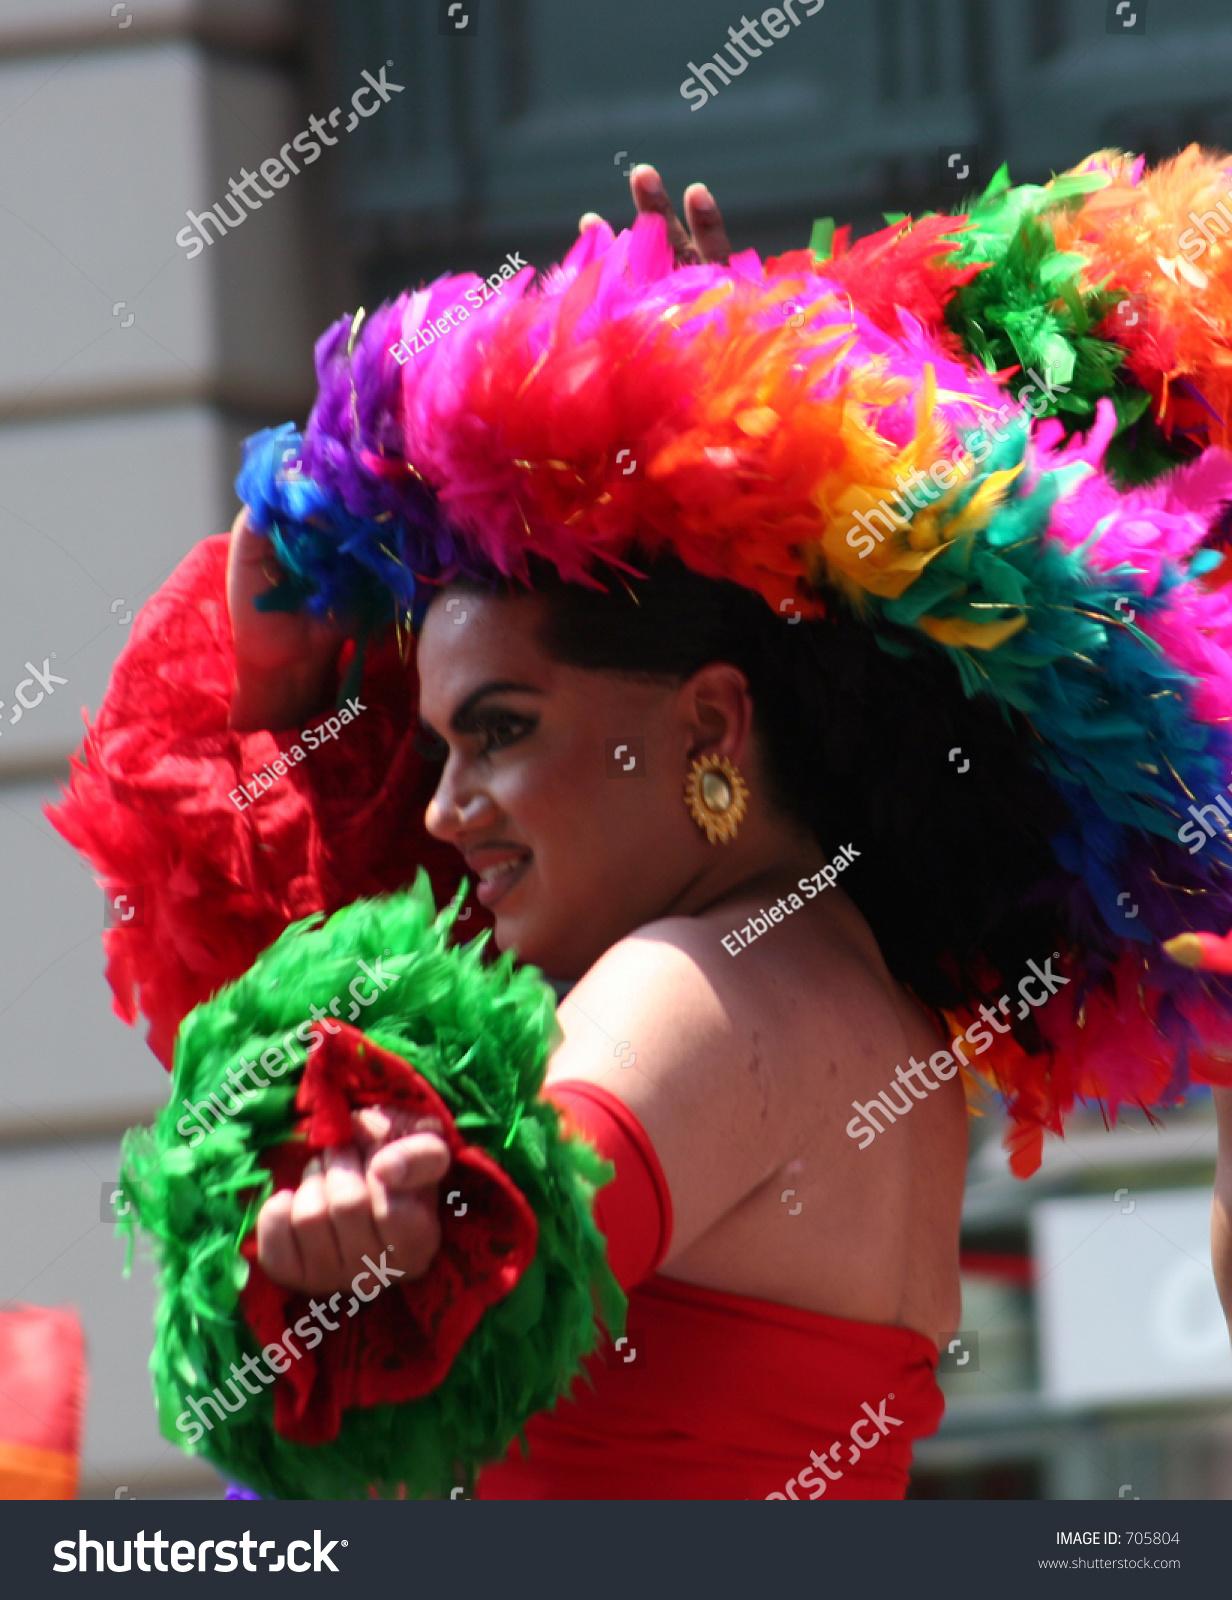 New York City Gay Pride Parade 2005